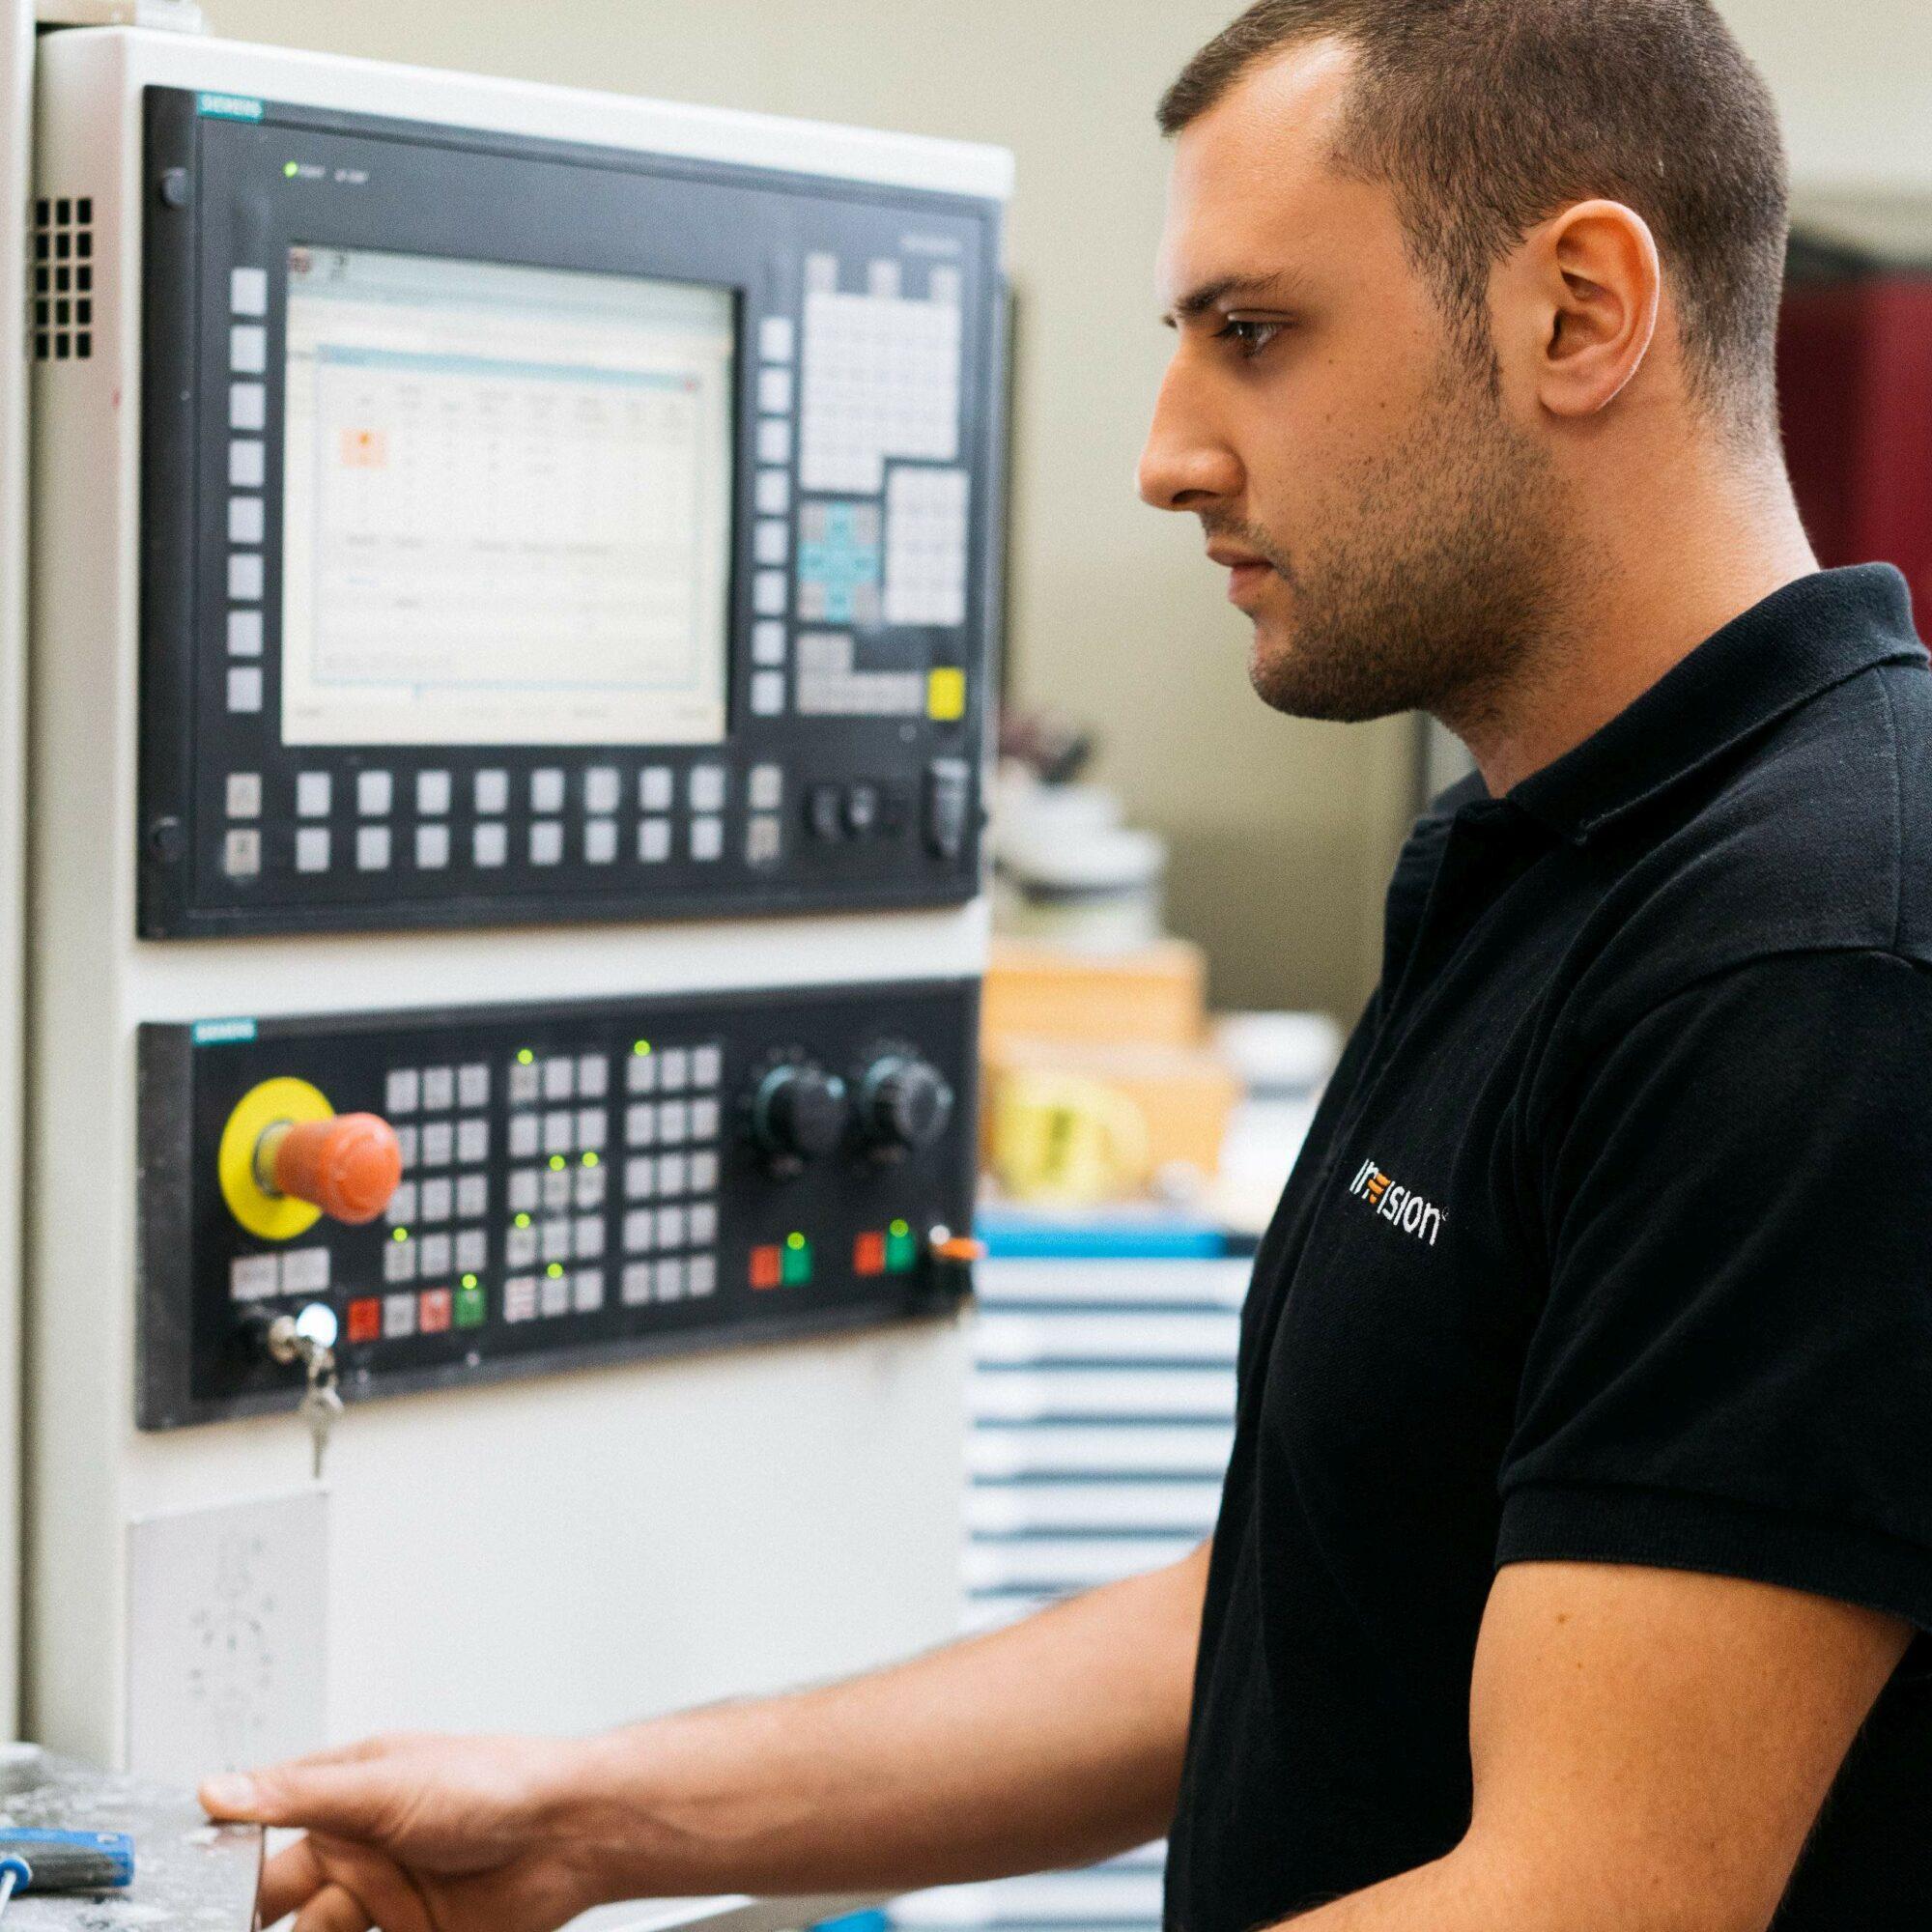 employee working on a machine